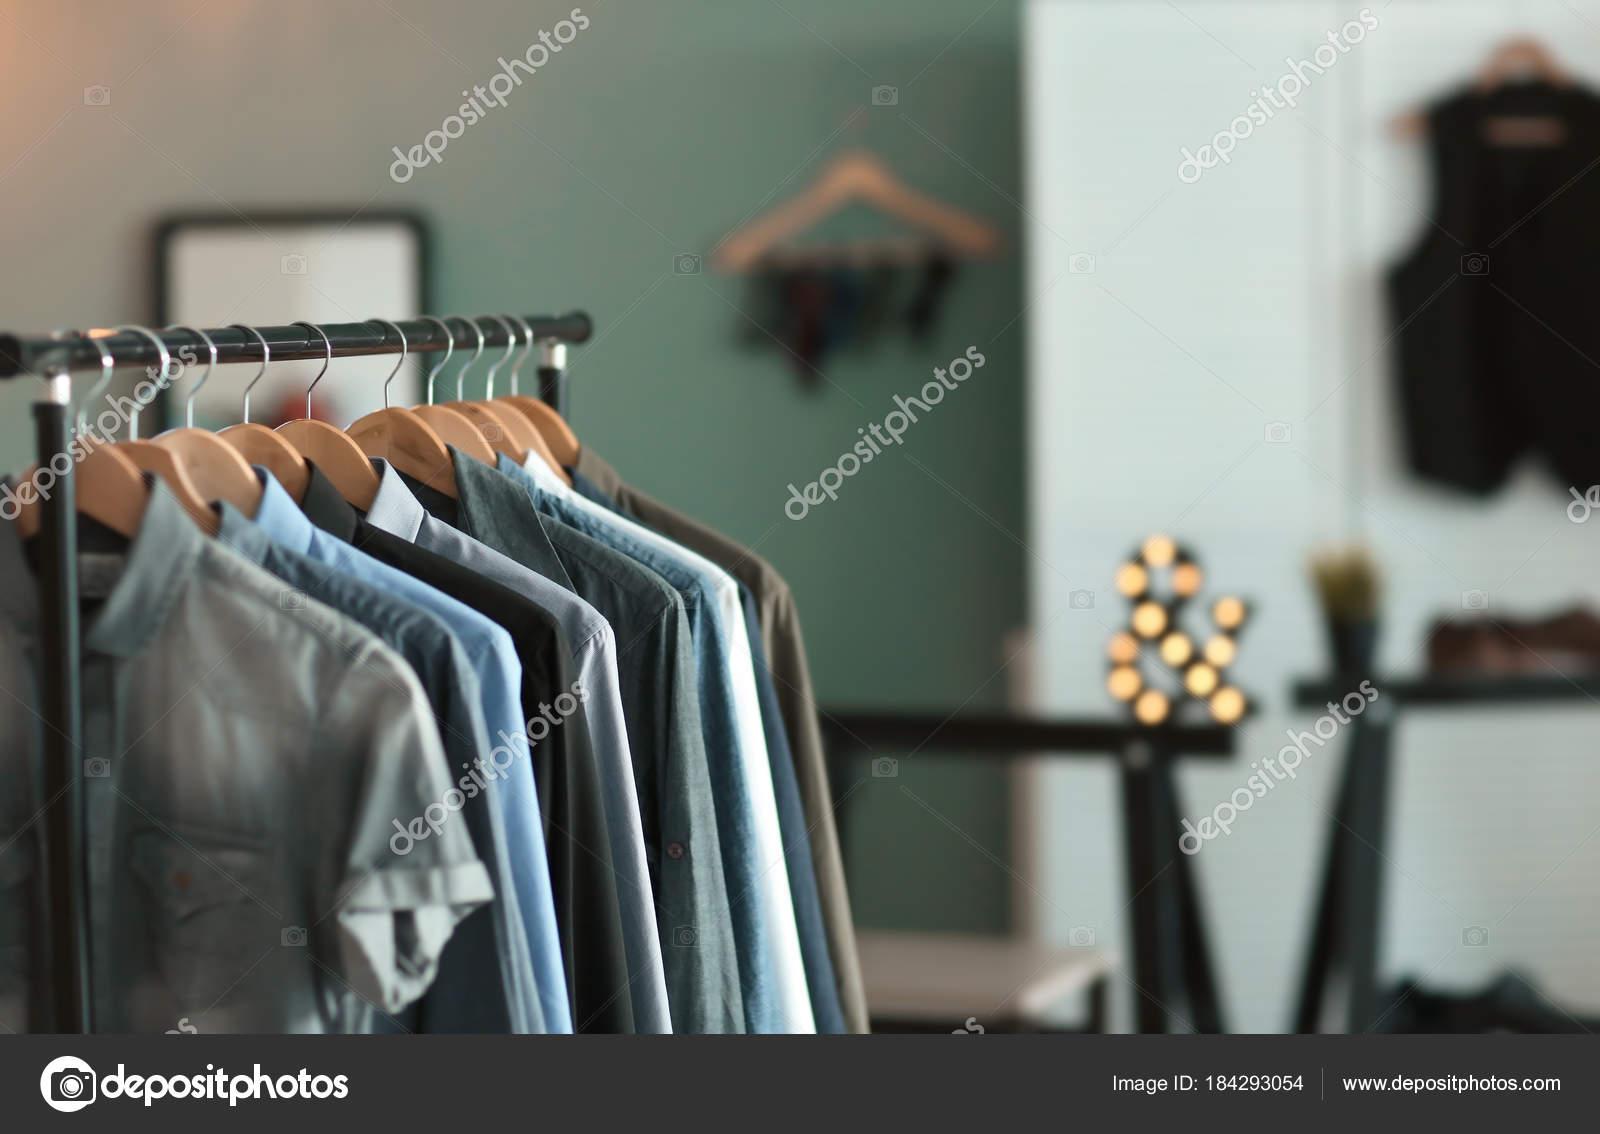 c8cd69ab4dc4 Κρεμάστρα ρούχων με πολλά πουκάμισα — Φωτογραφία Αρχείου ...